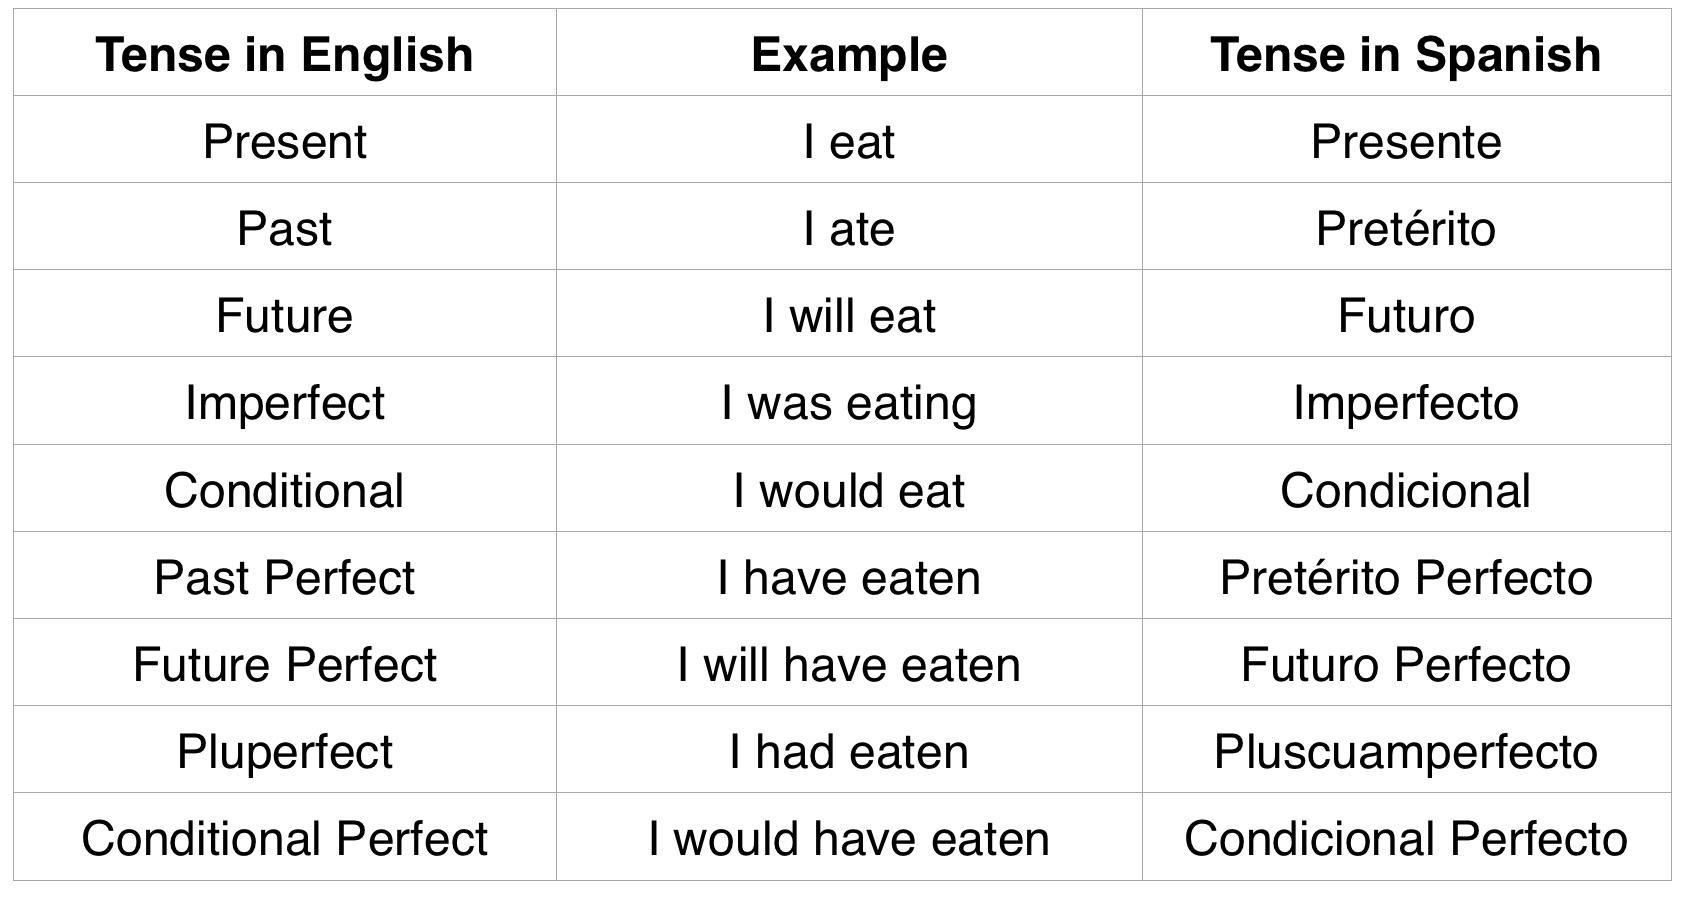 Spanish Present Tense Verb Endings Table